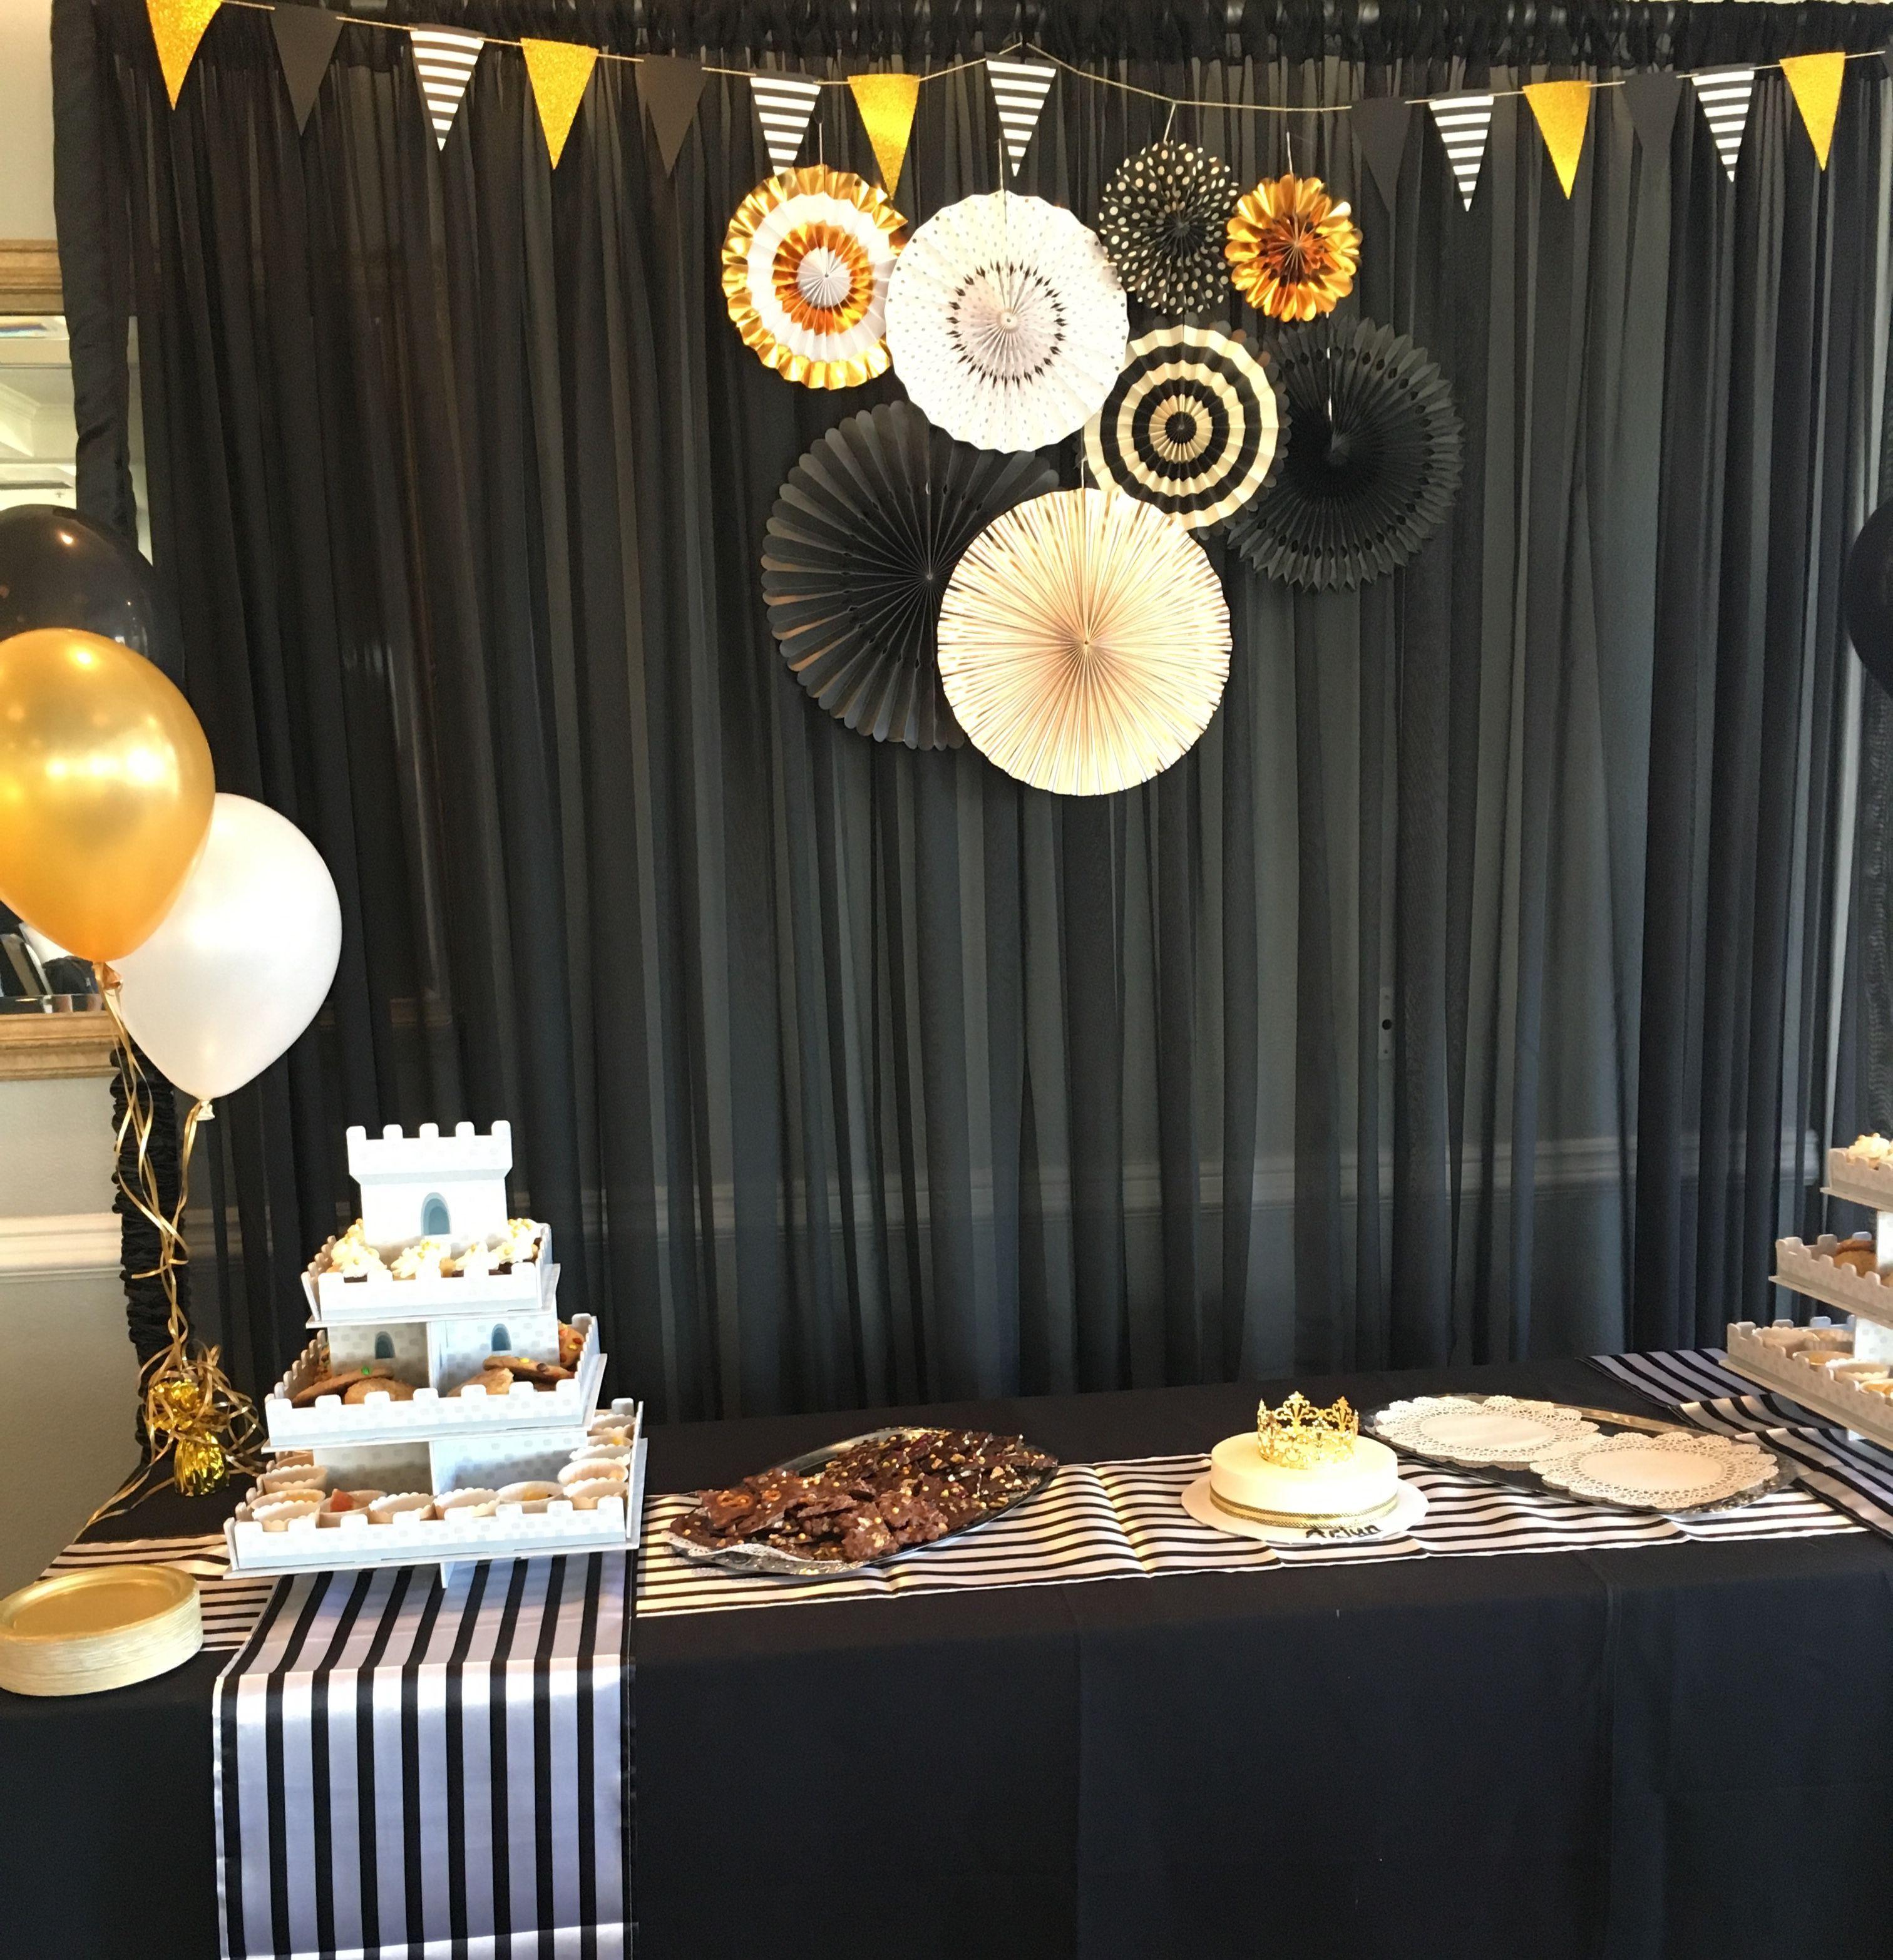 Black Drape Backdrop For 1st Birthday Party.